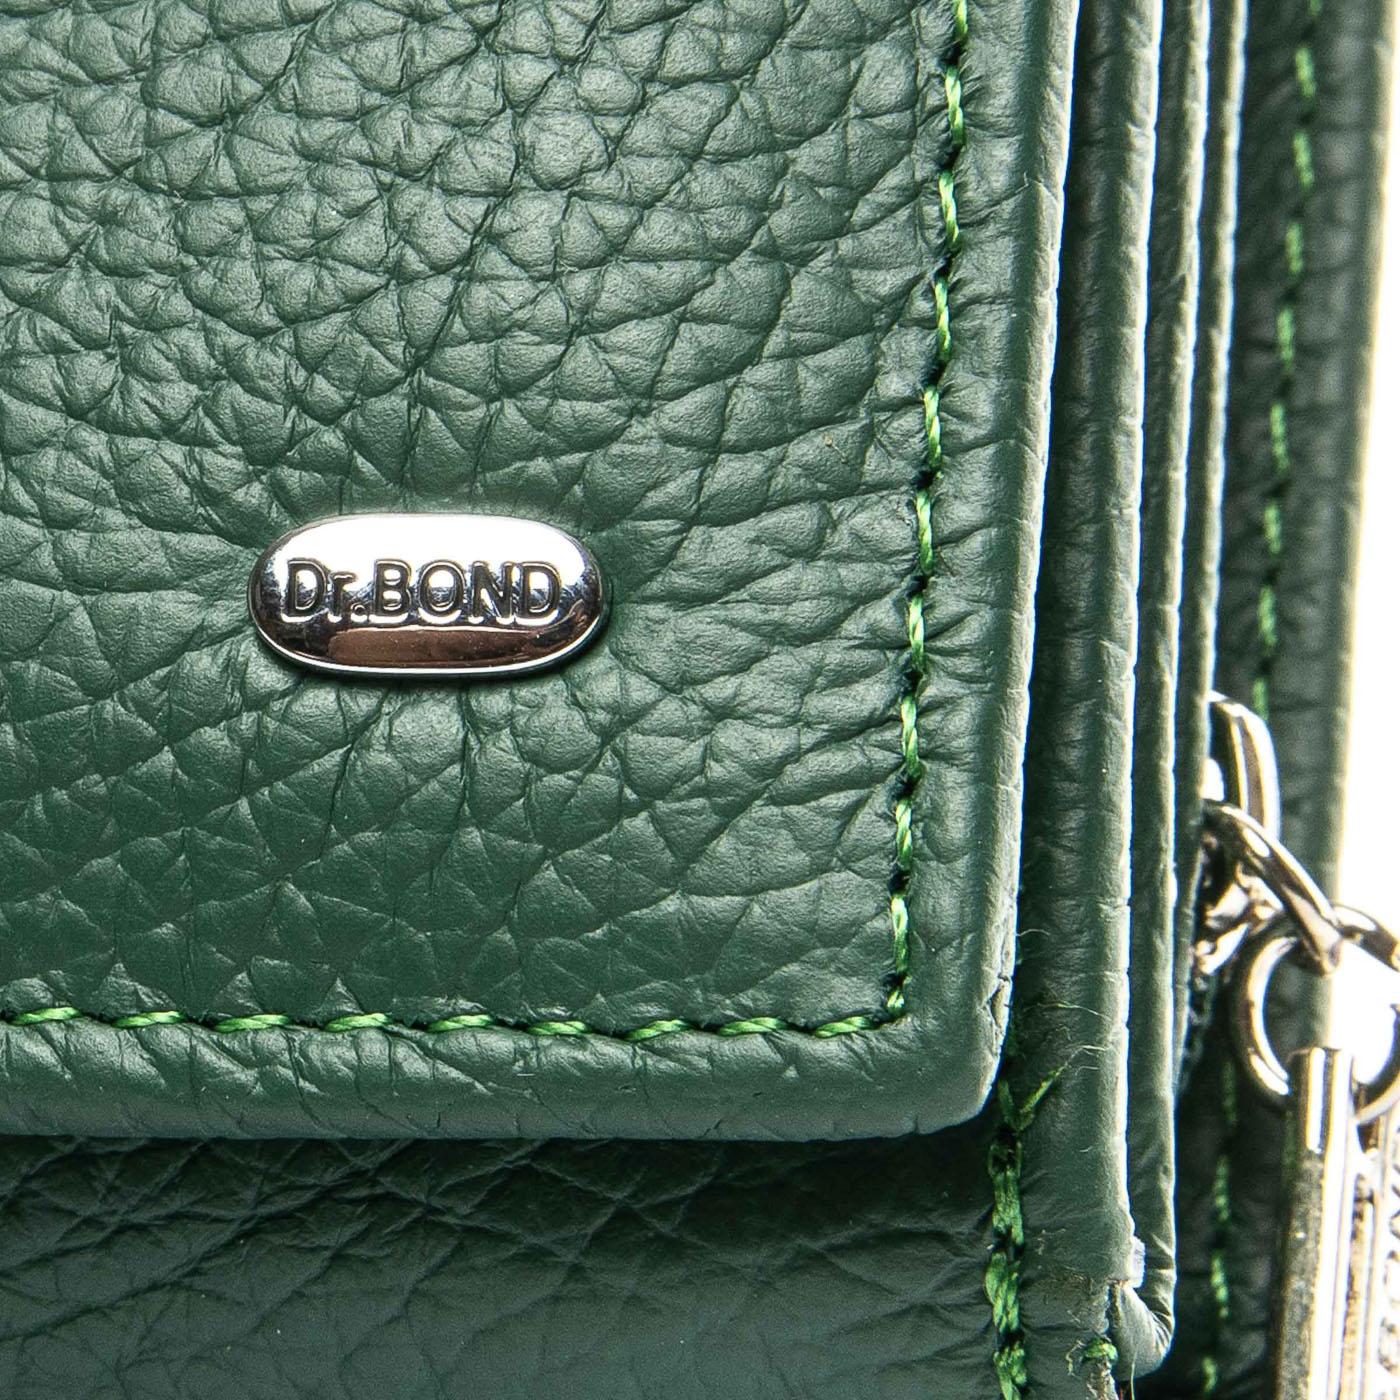 Кошелек Classic кожа DR. BOND WS-10 green - фото 3